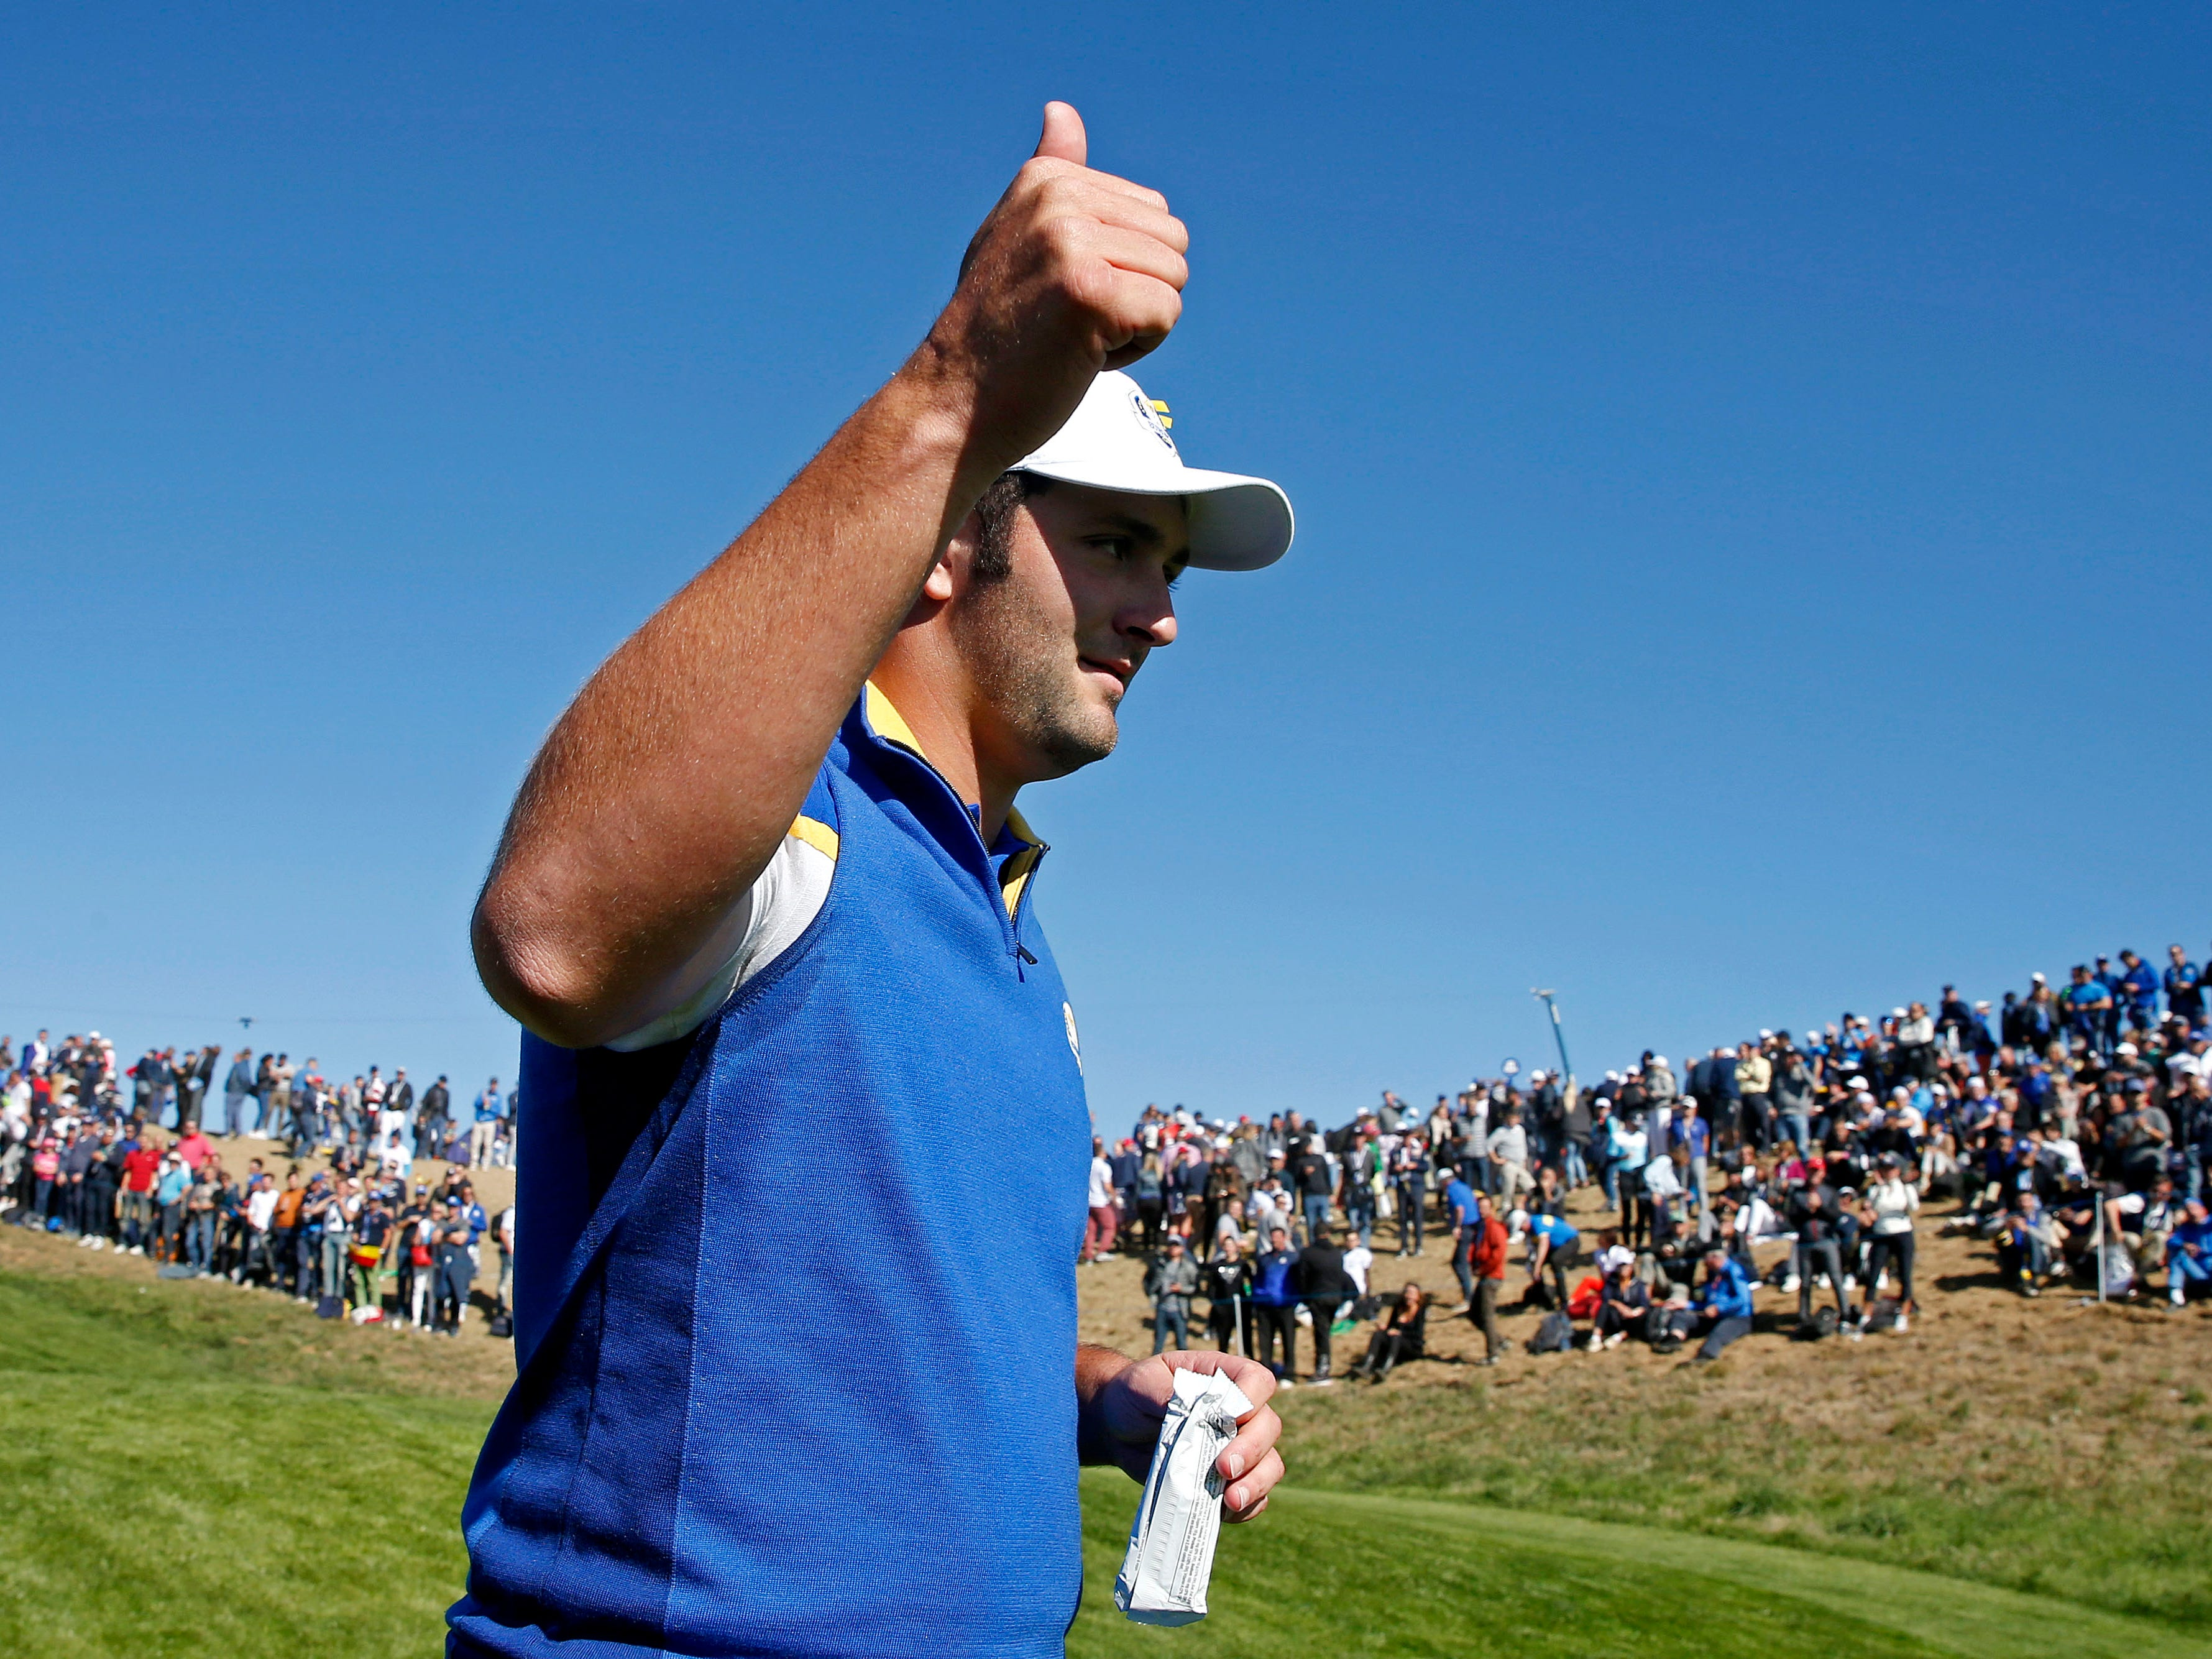 Europe golfer Jon Rahm on the third hole during the Sunday singles matches.